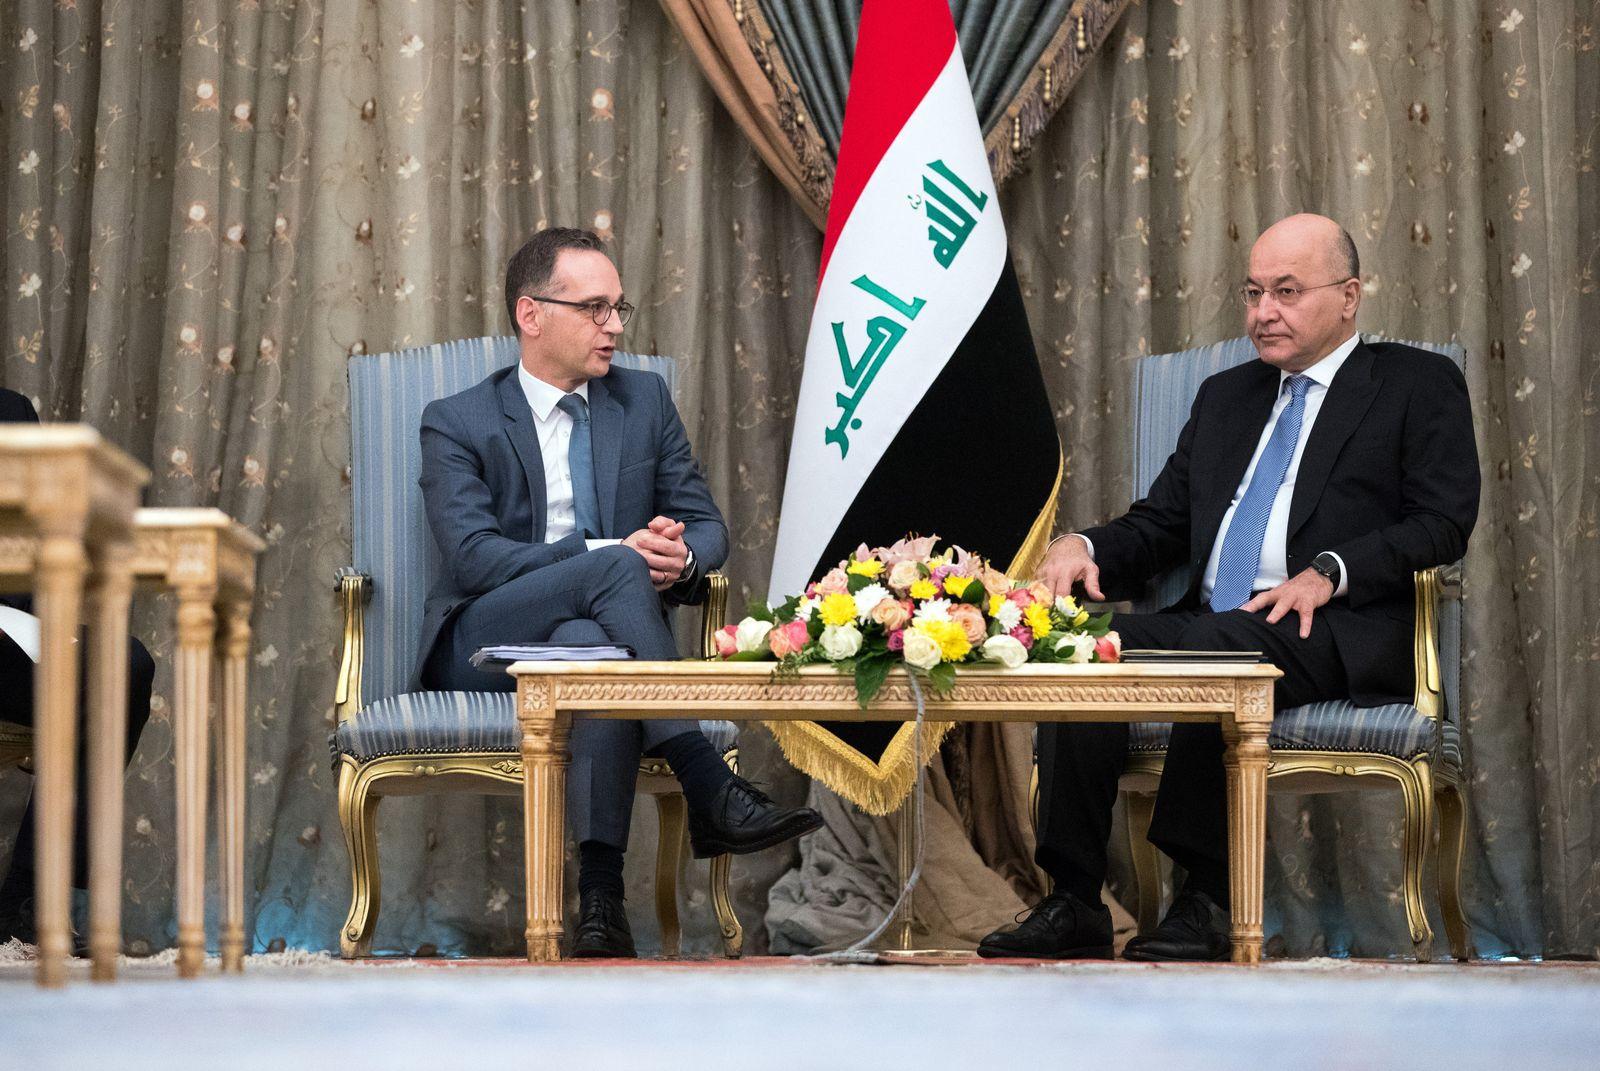 Außenminister Maas Irak